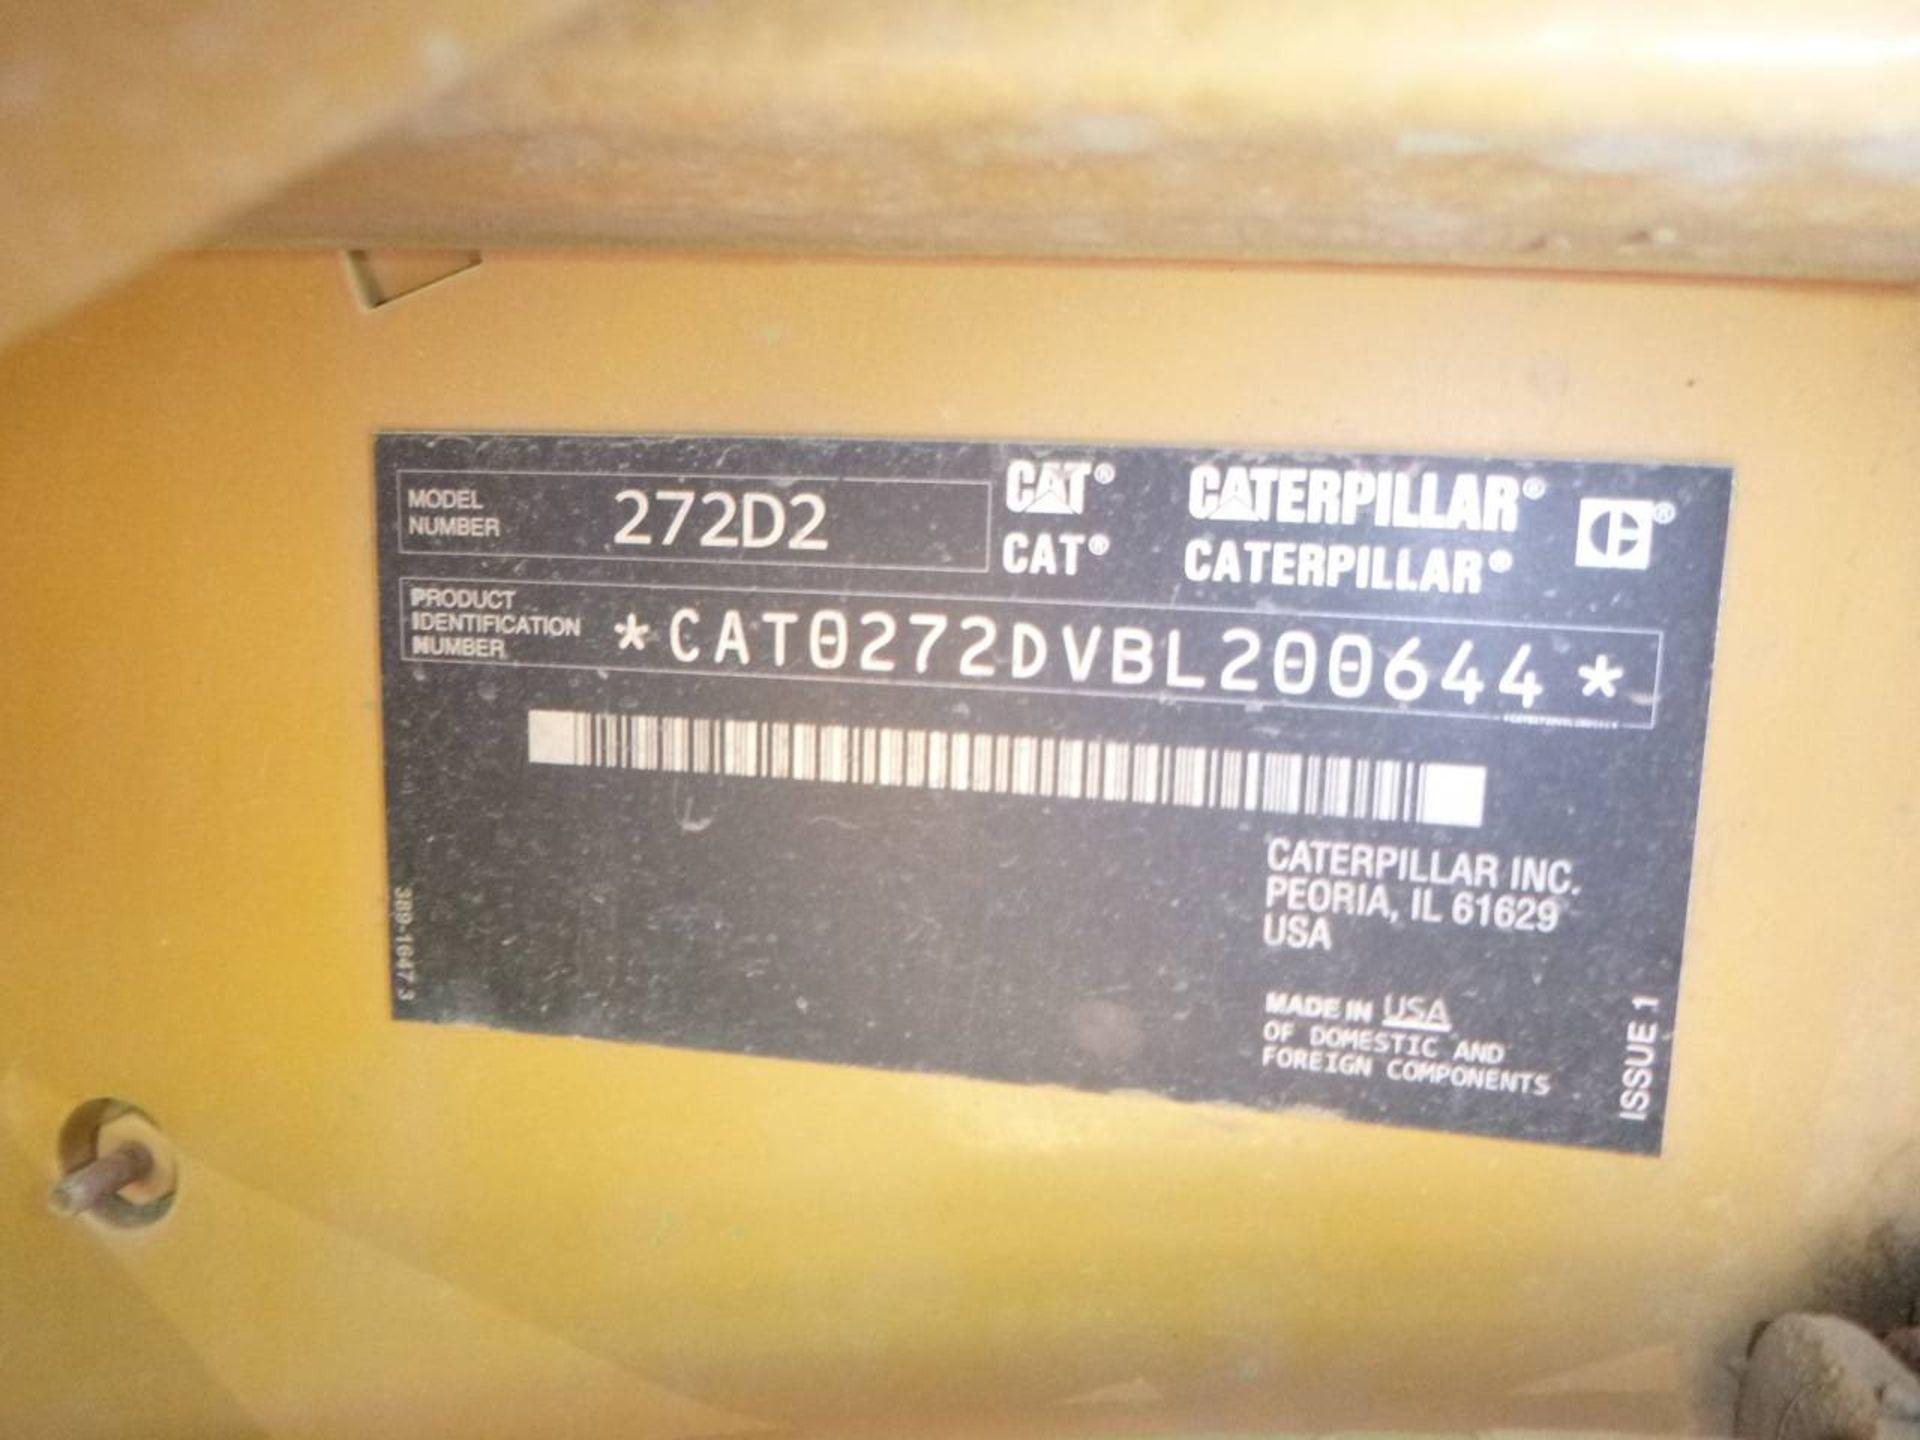 2017 Caterpillar 272D2 Skid Steer Loader - Image 8 of 8